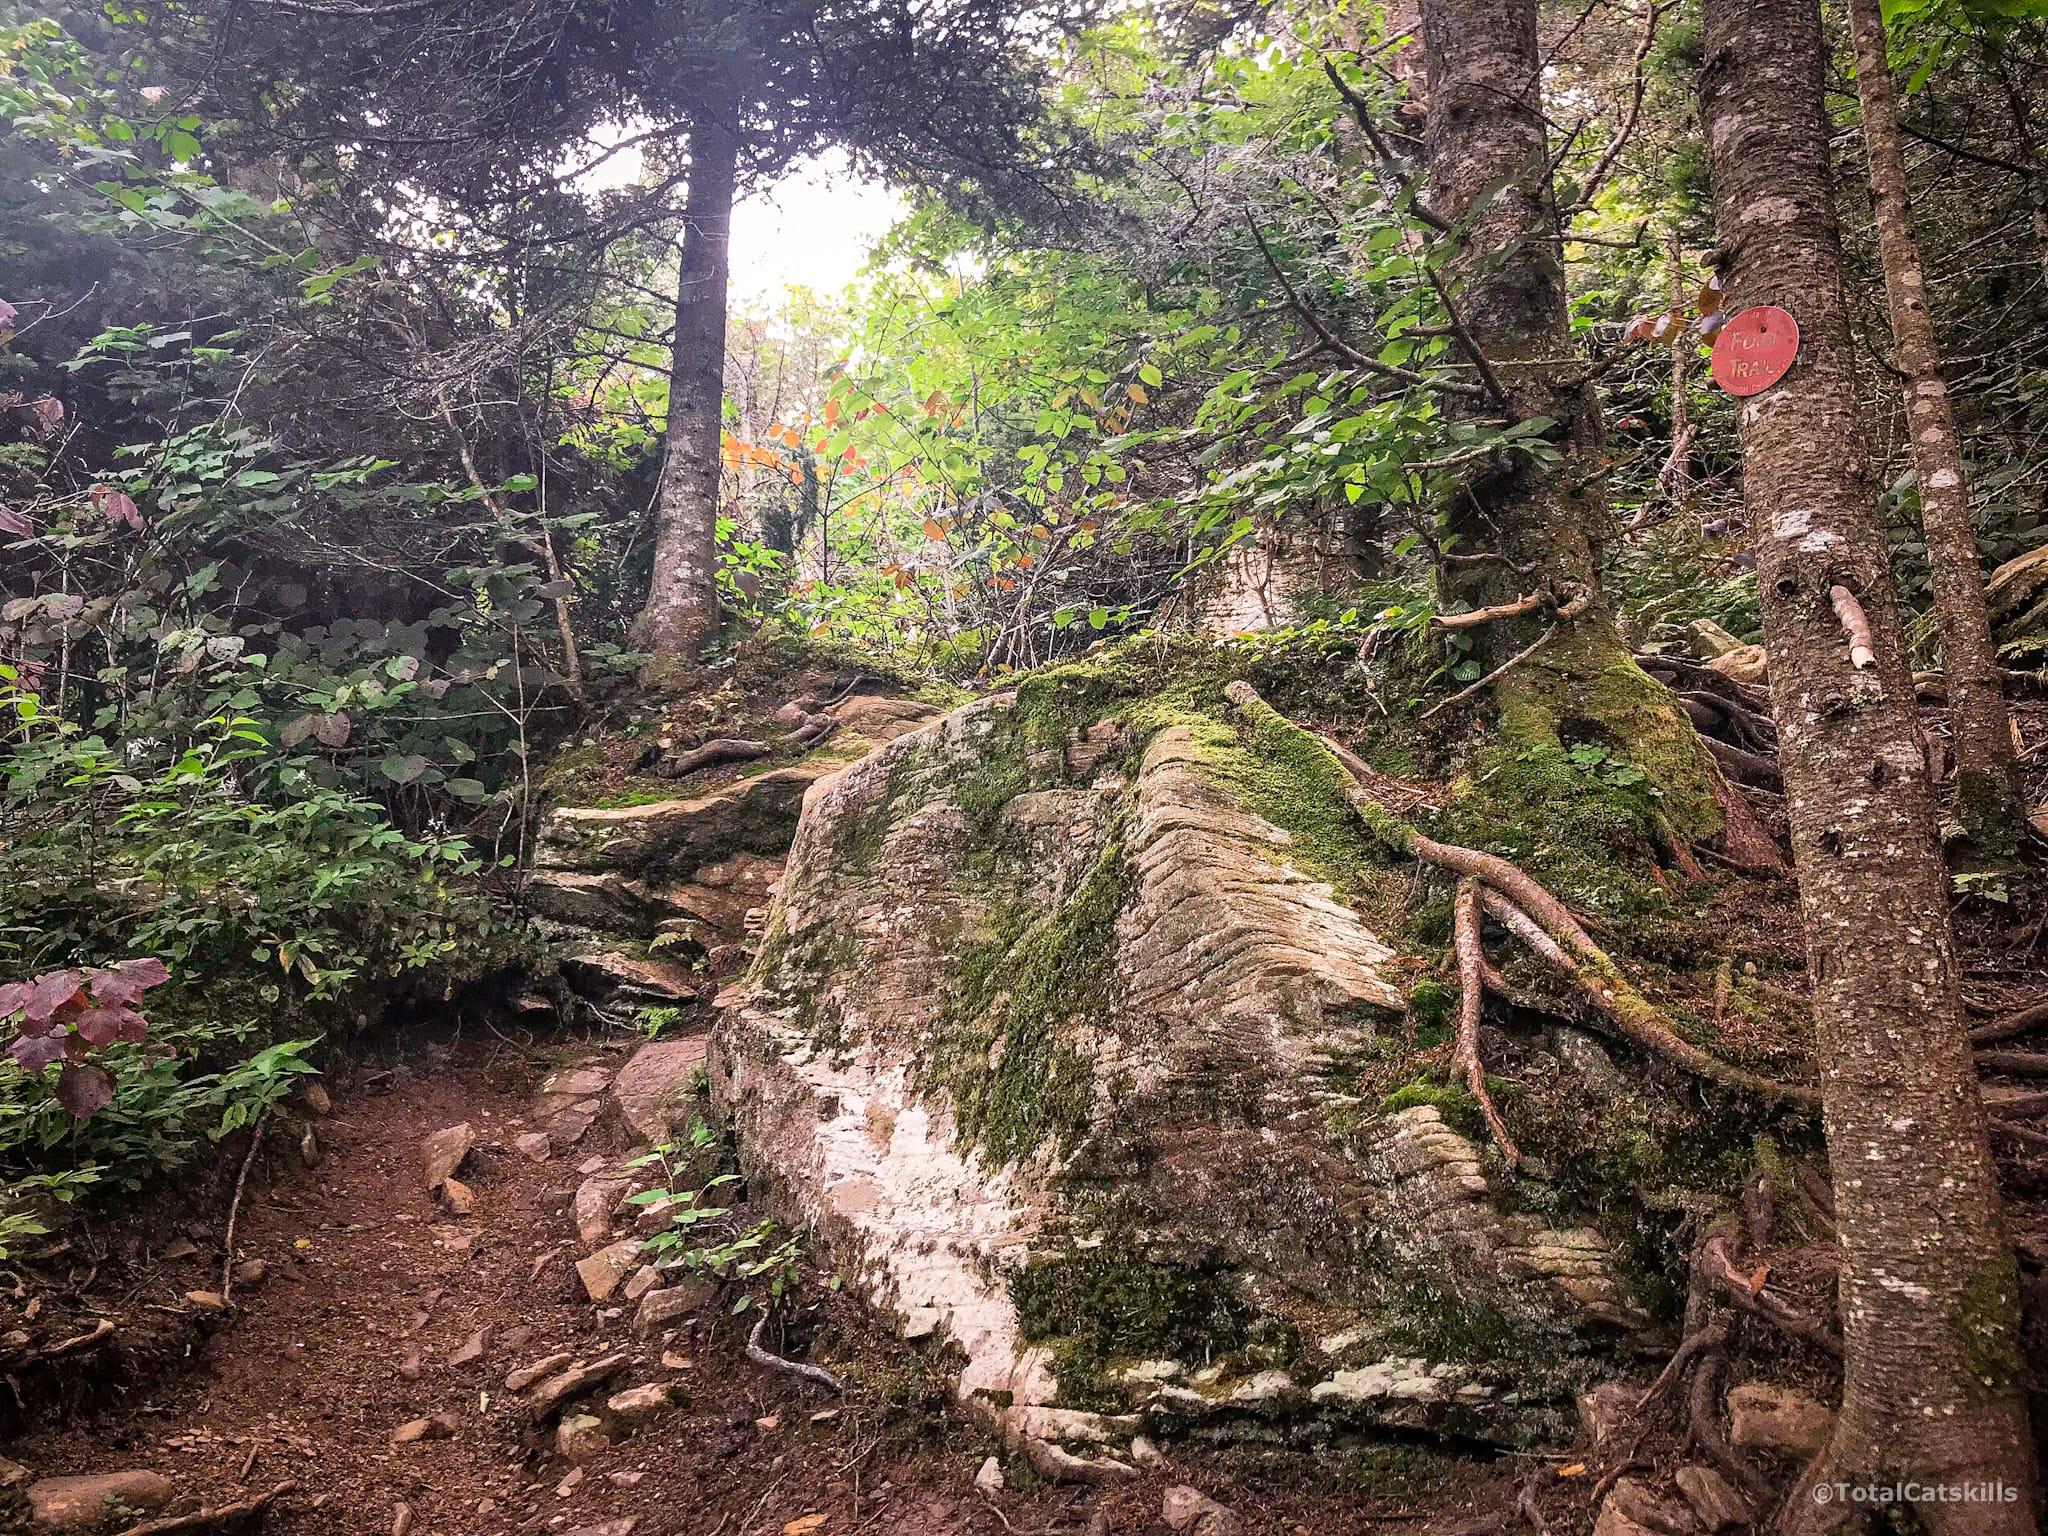 rock outcrop, trees